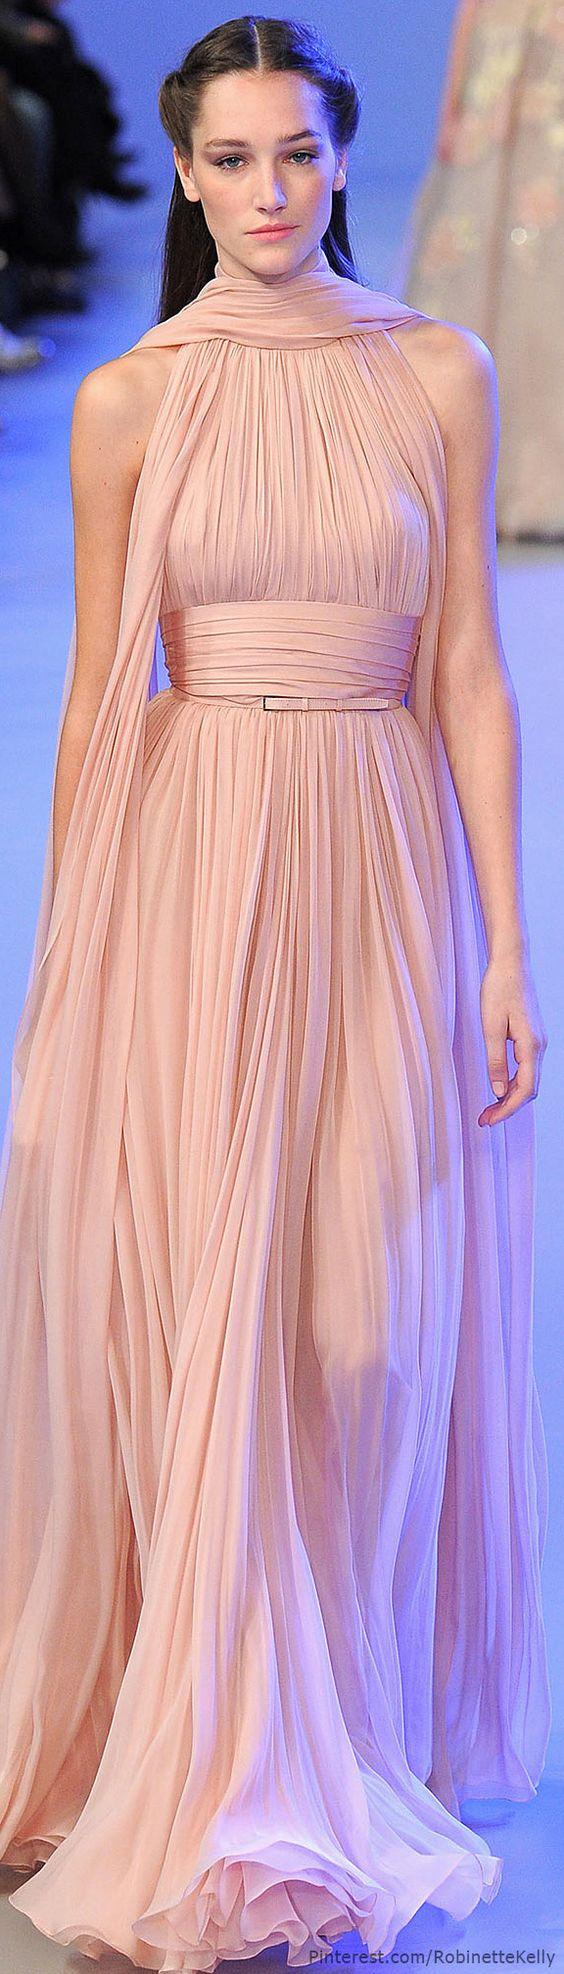 Elie Saab Haute Couture | S/S 2014 | LBV ♥✤ | KeepSmiling | BeStayElegant